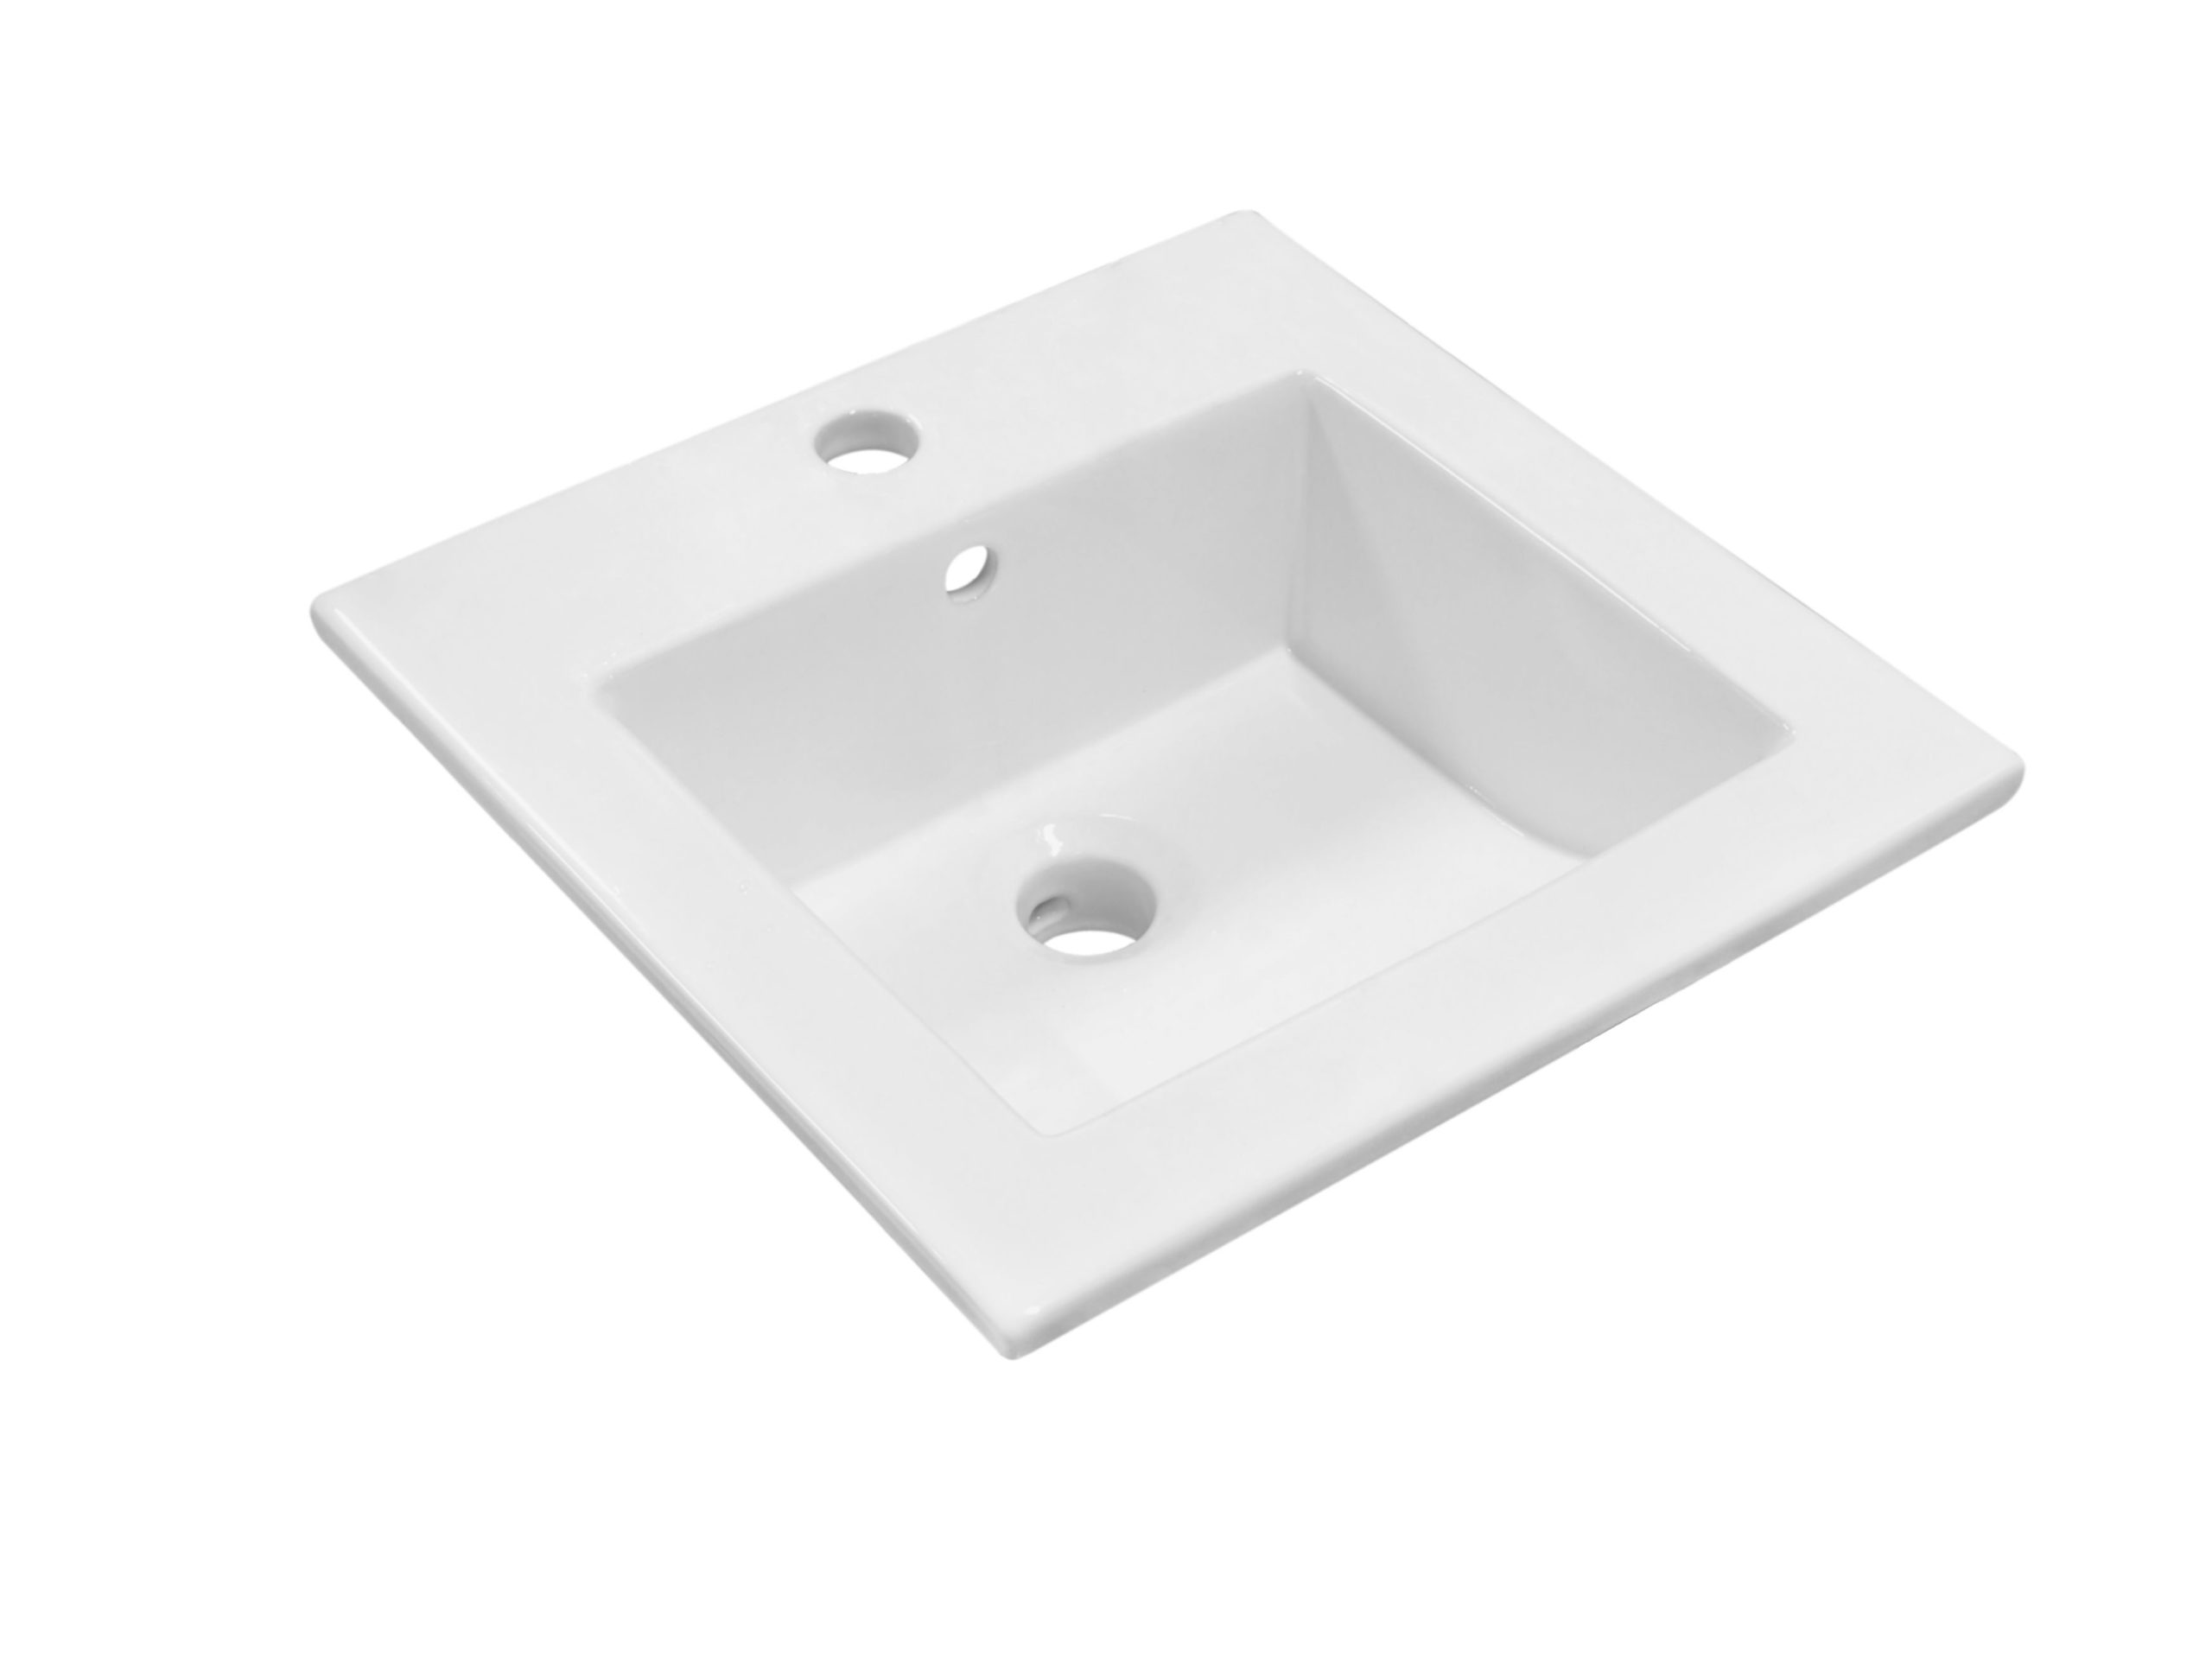 Kerra KR 41 inbouw wastafel 41,5x41,5cm wit